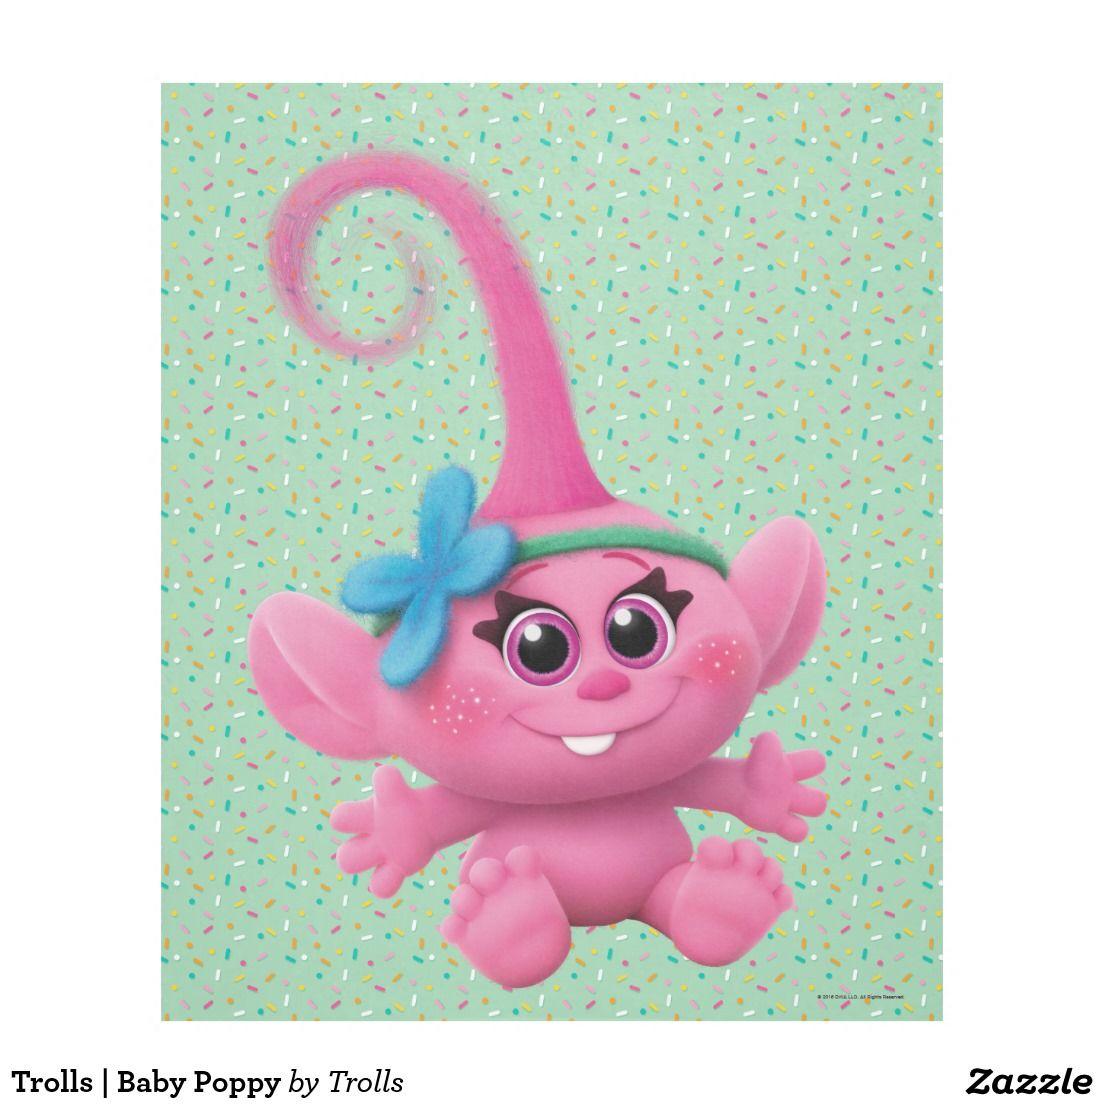 Trolls Baby Poppy Fleece Blanket Trolls Movie Clothing